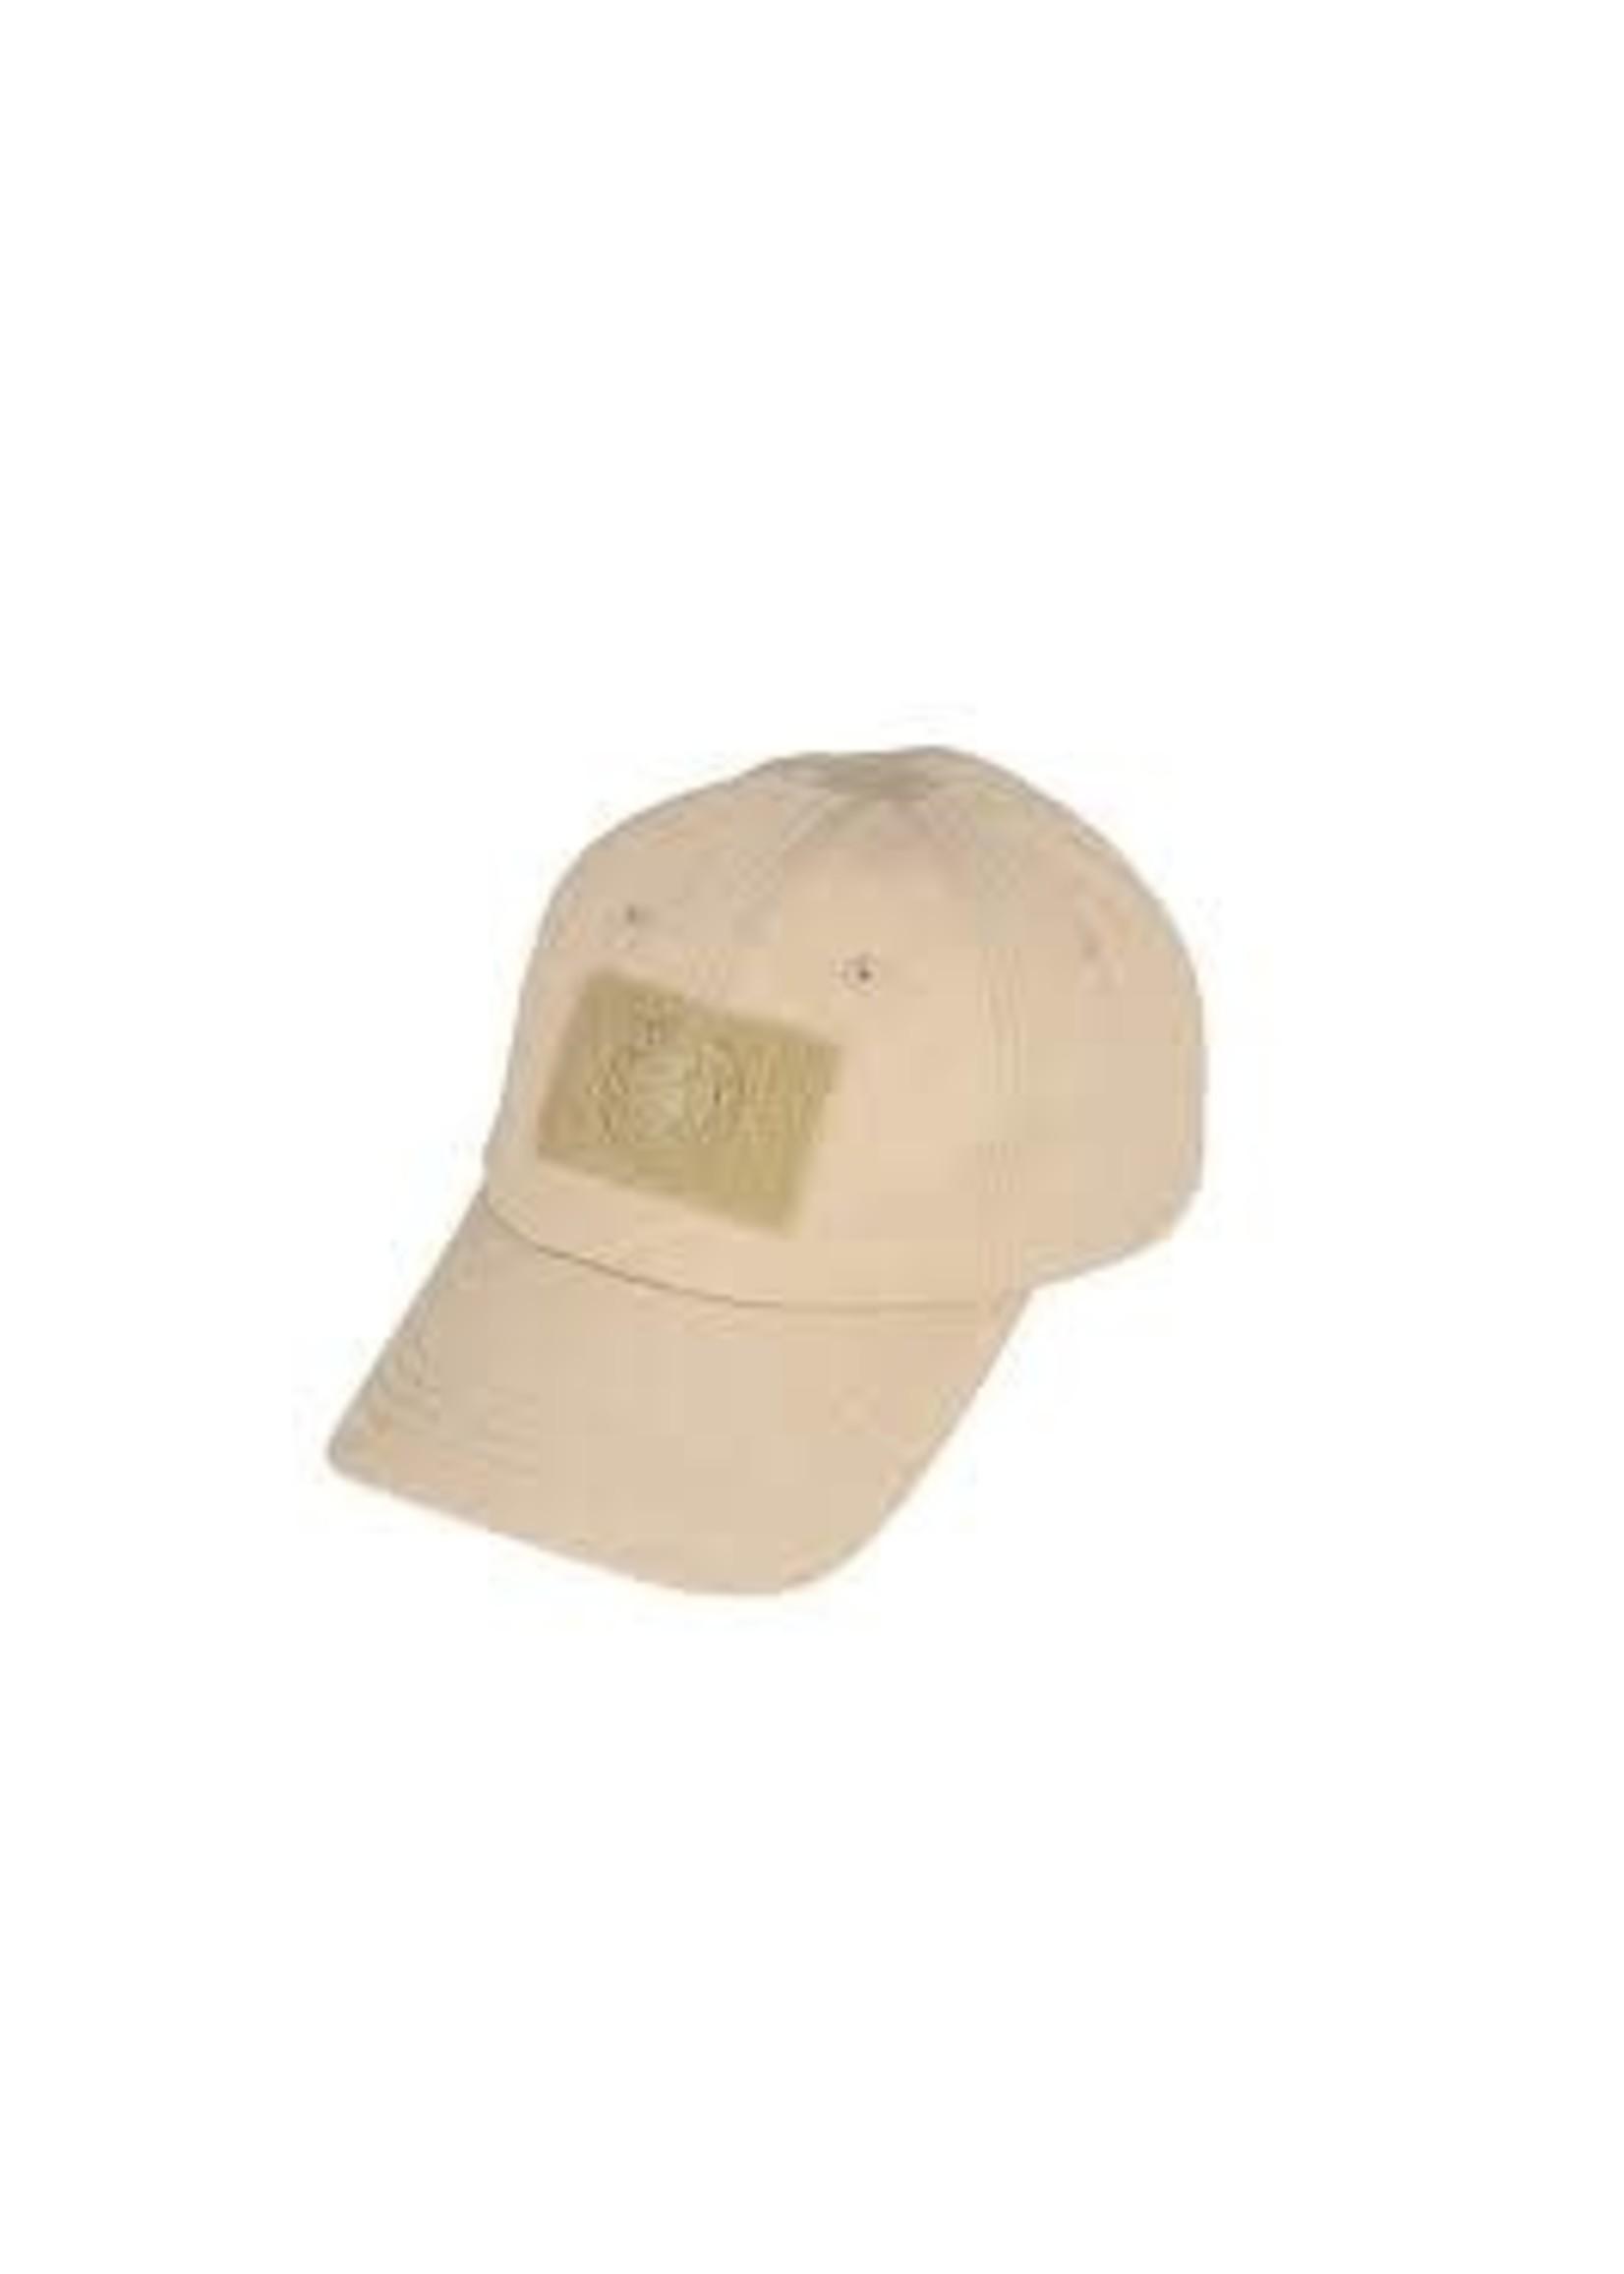 LANCER TACTICAL LANCER TACTICAL TAN HAT